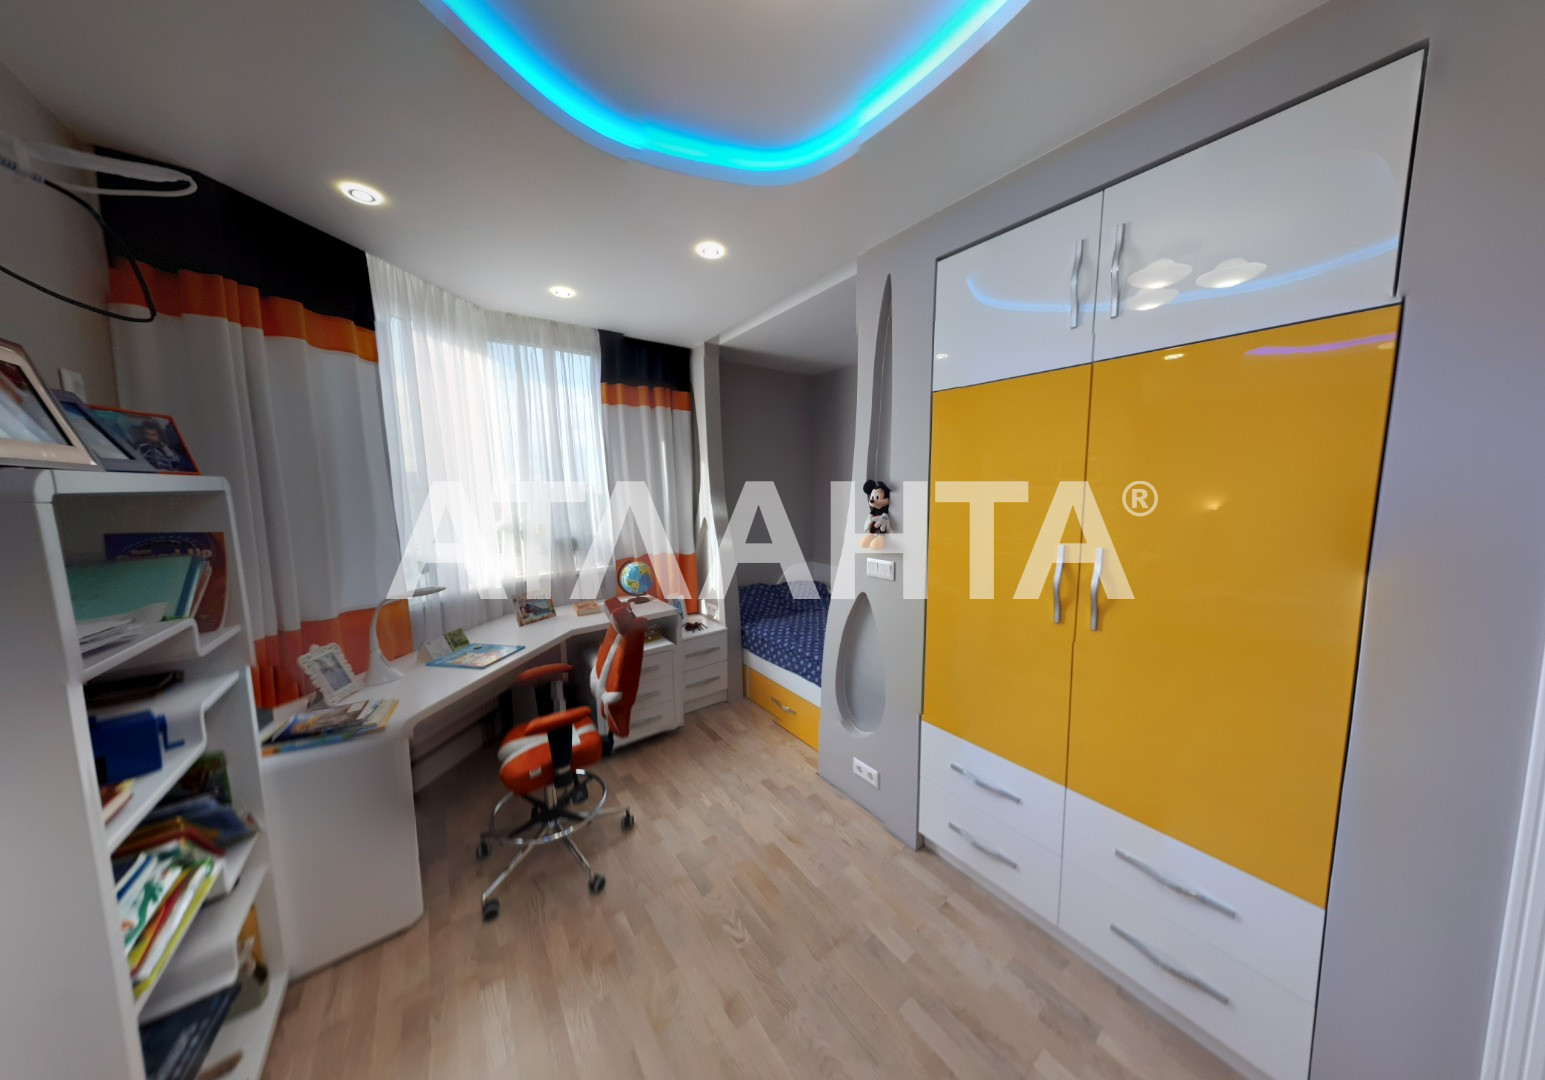 Продается 3-комнатная Квартира на ул. Ул. Ломоносова — 230 000 у.е. (фото №11)